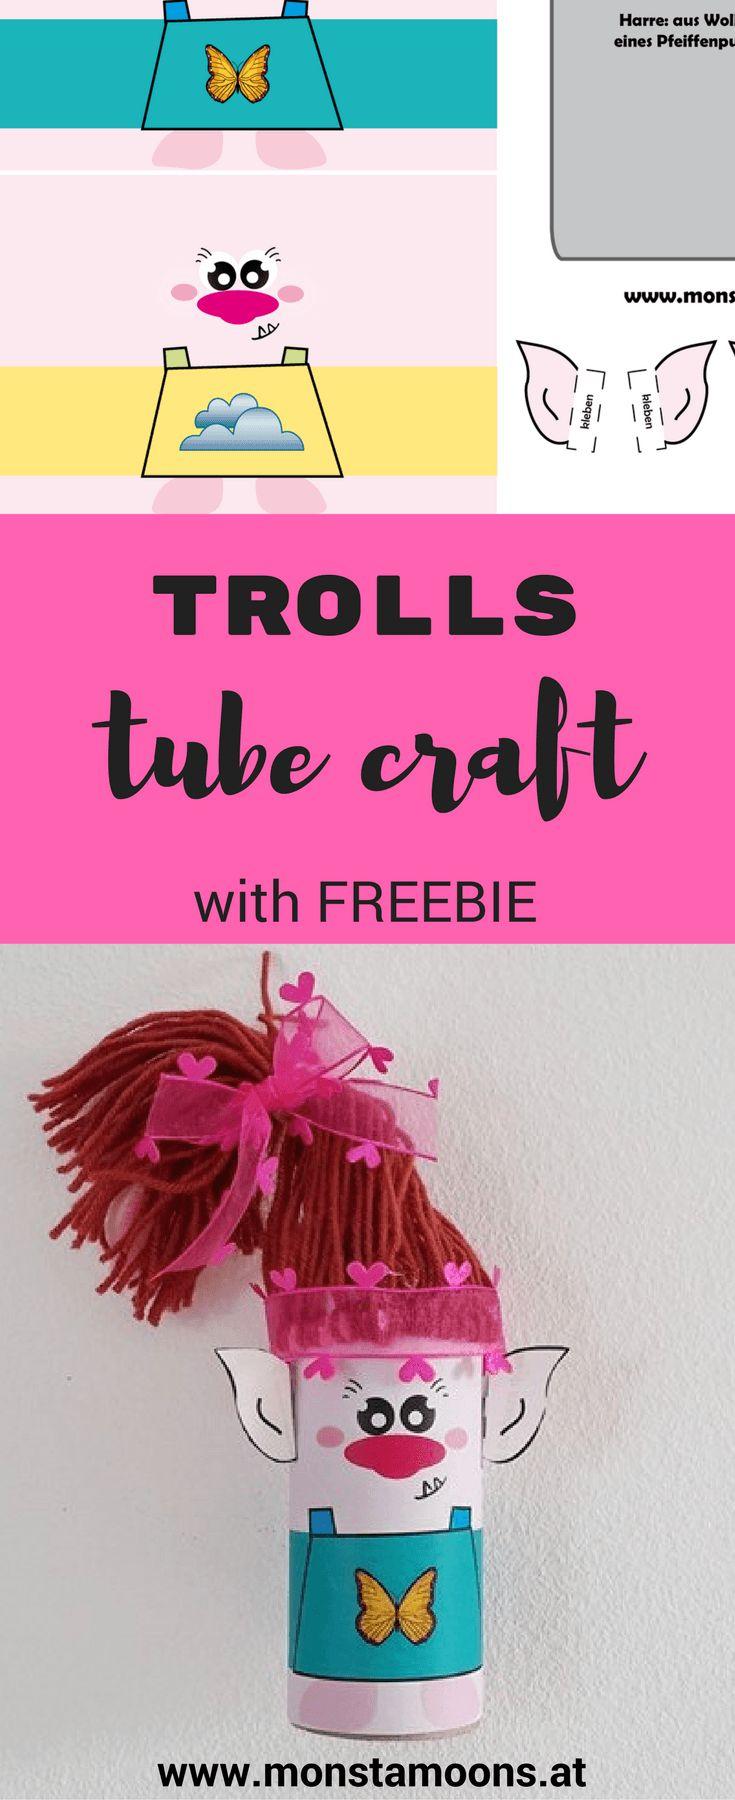 paperroll crafts, Basteln mit Klopapierrollen, Troll basteln, craft a troll, Trolls, paperroll Troll, Klopapierrollen Troll